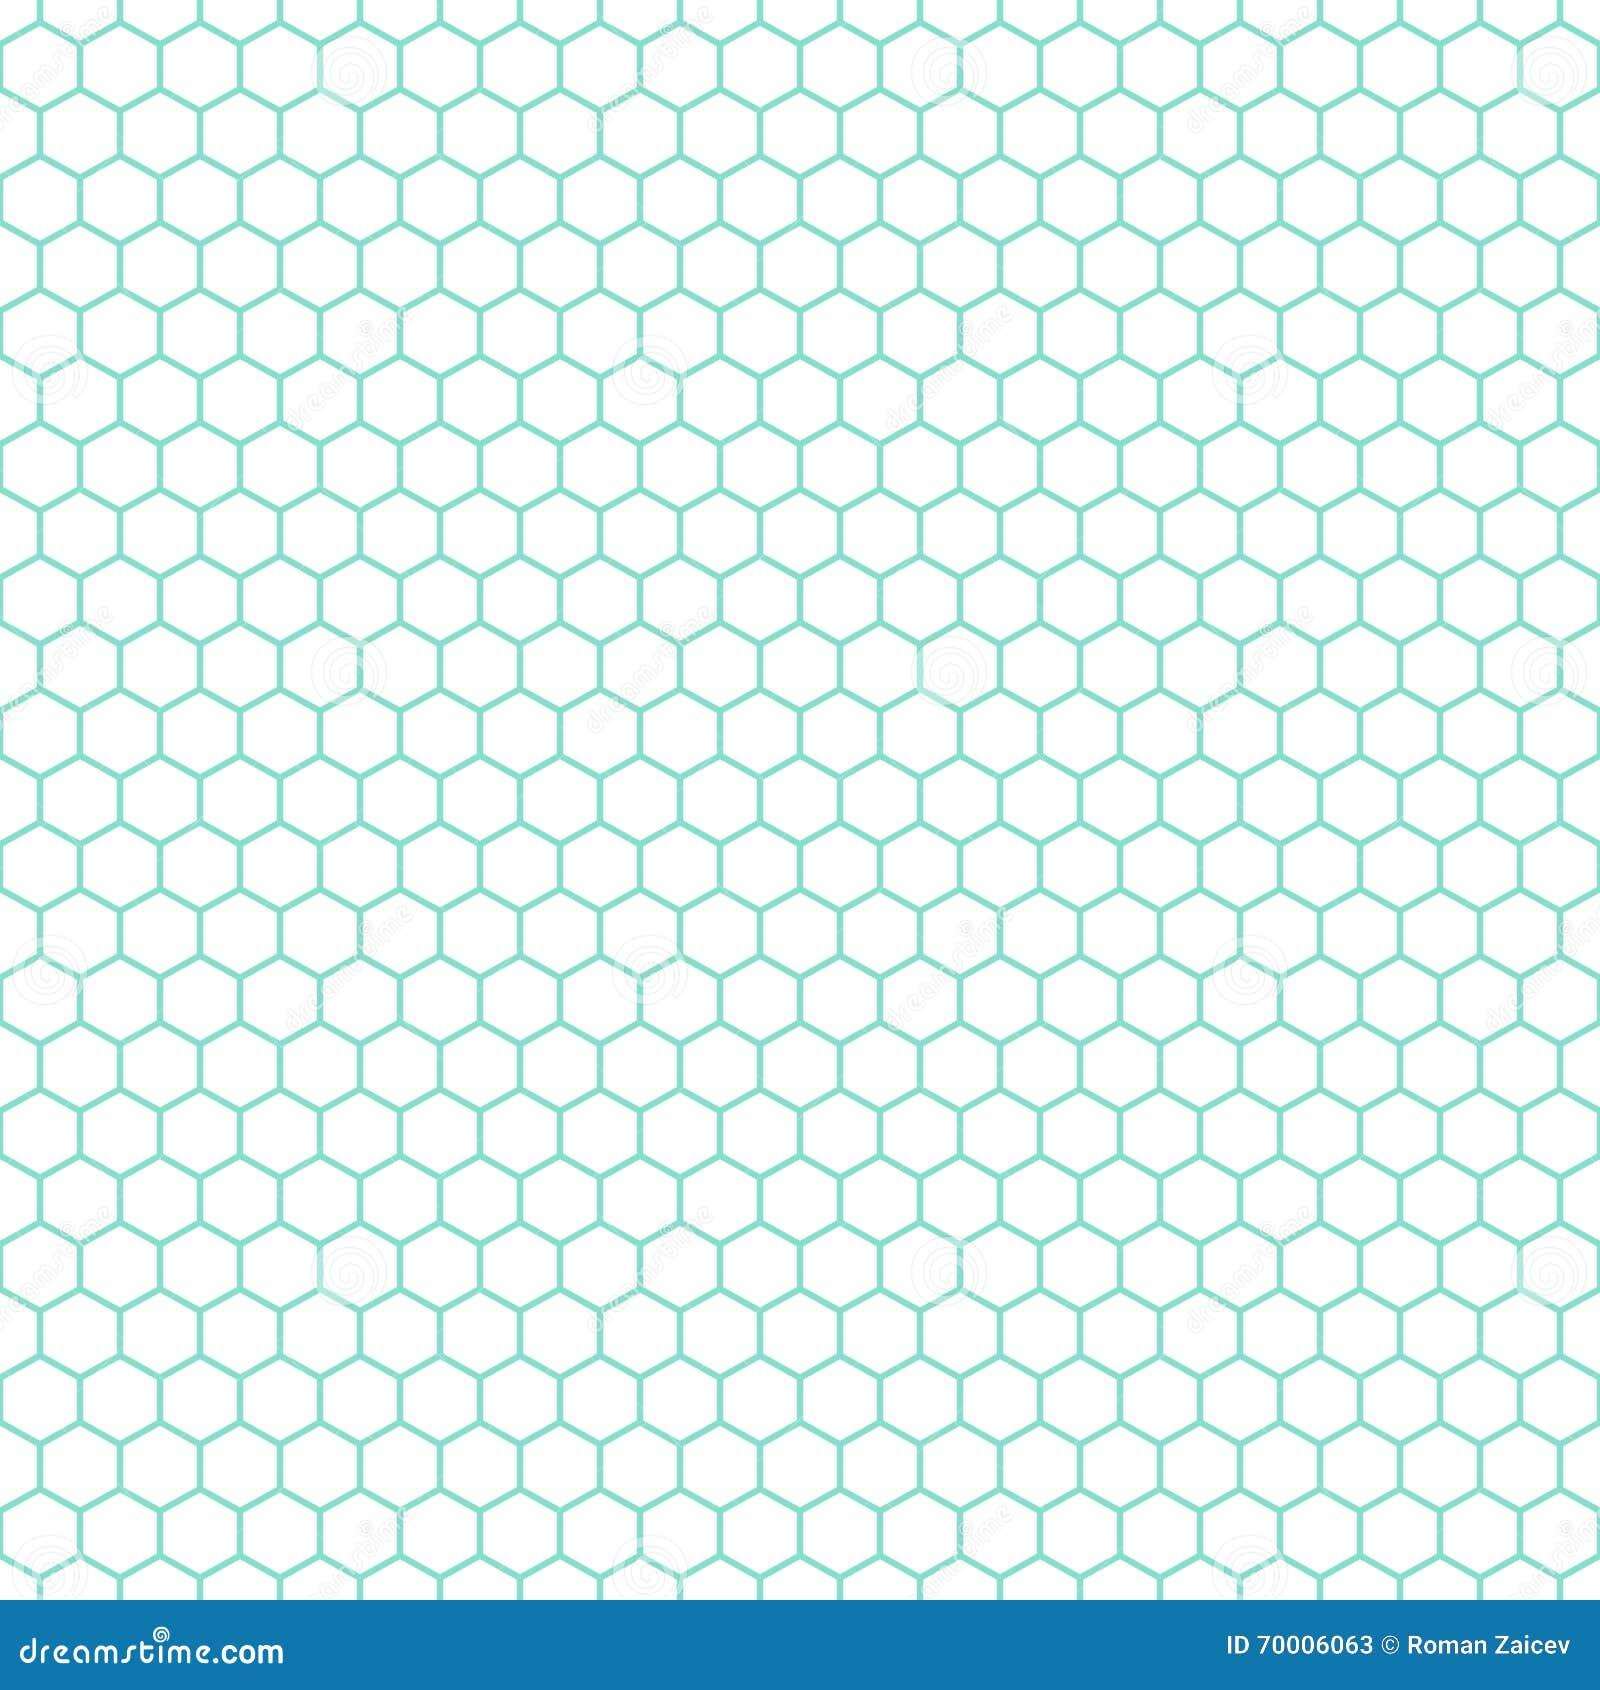 White Amp Aqua Honeycomb Pattern Seamless Texture